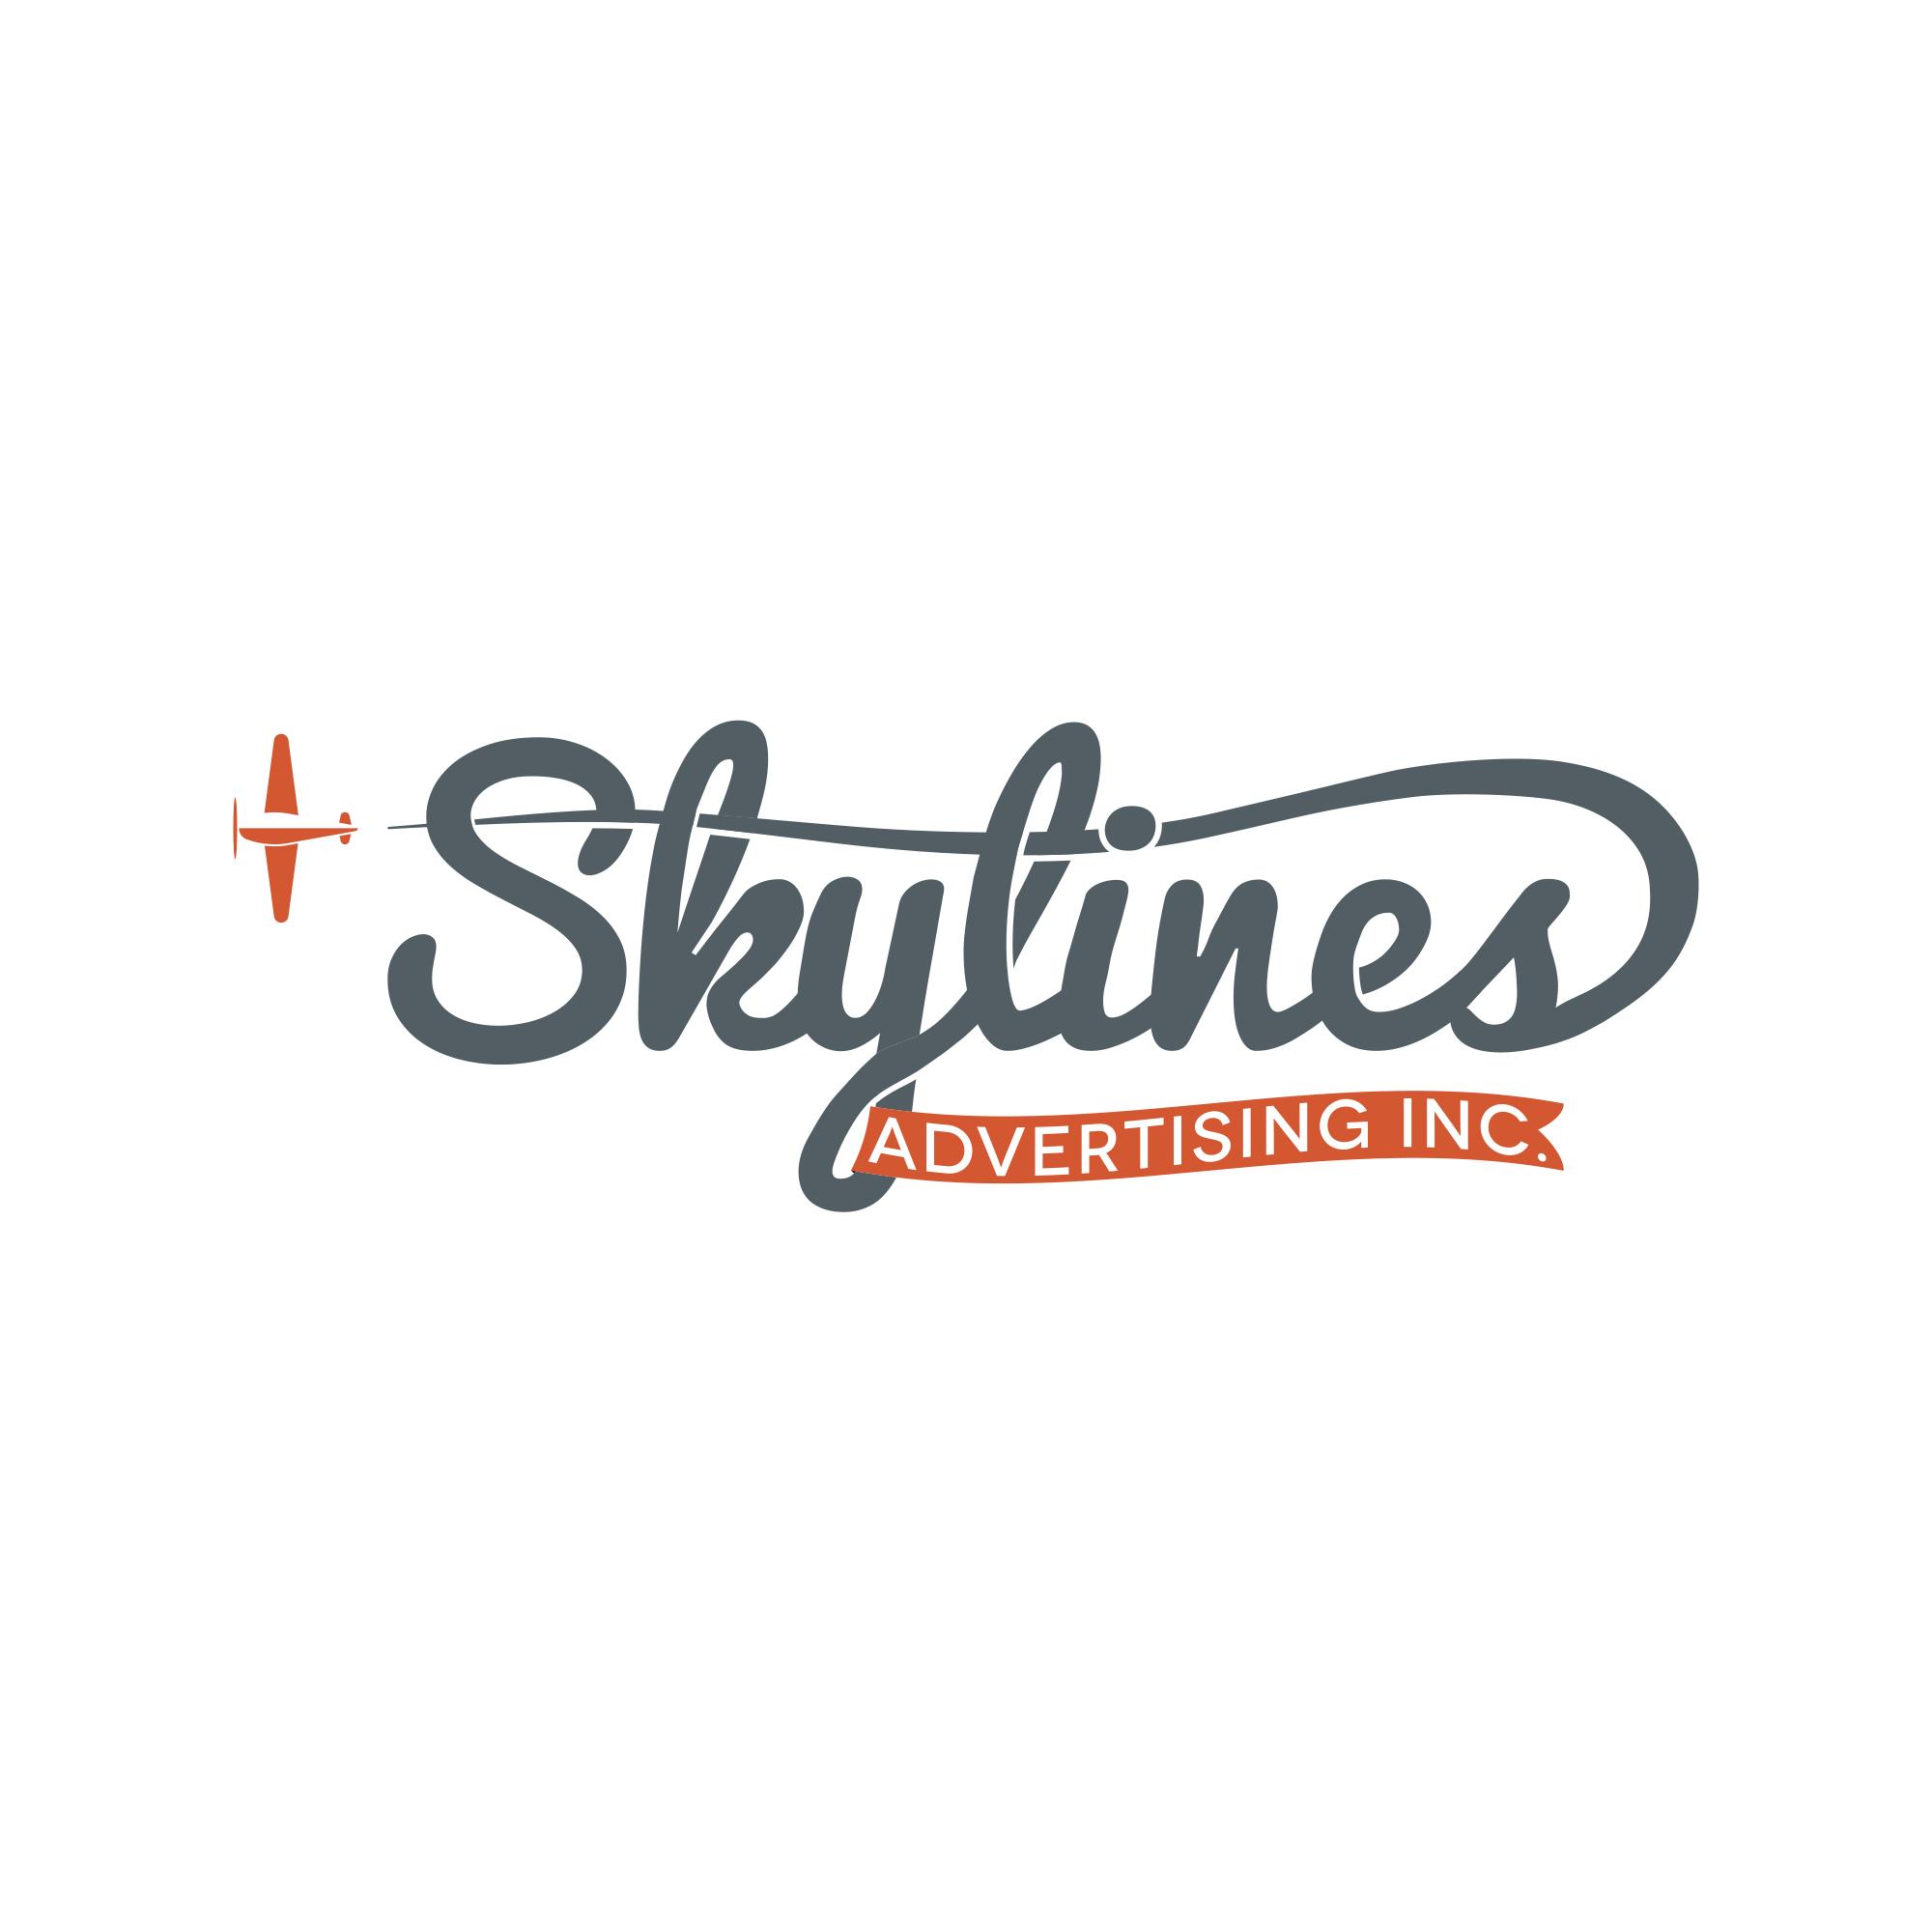 skylines_advertising_inc